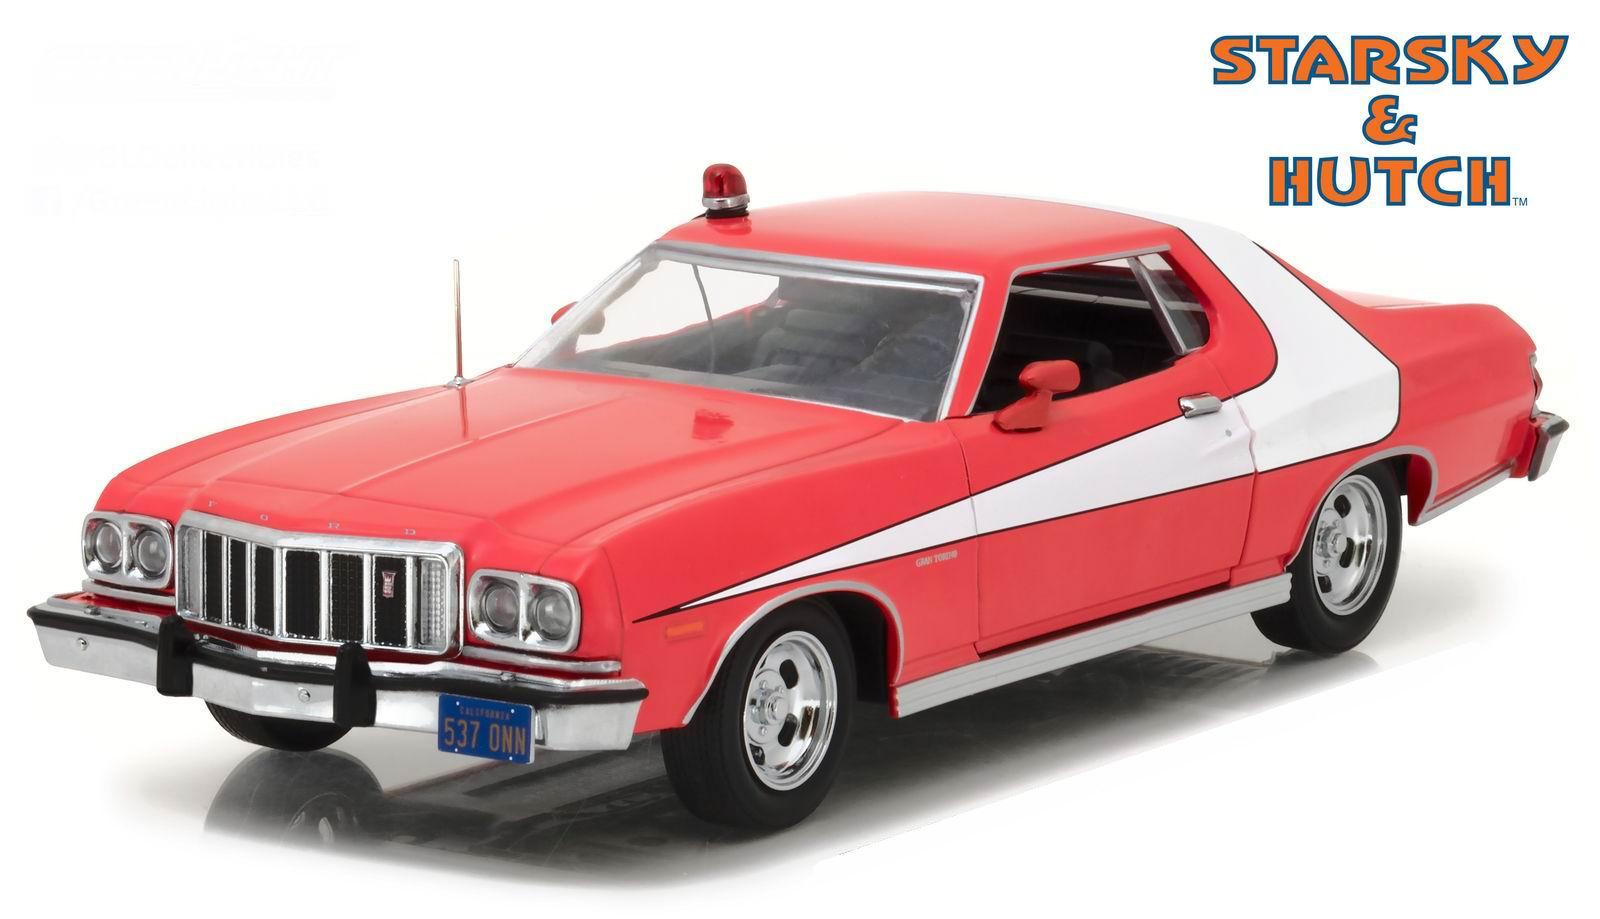 Voiture miniature métal Ford Gran Torino 1976 du Film Starsky et Hutch 1/24 greenlight